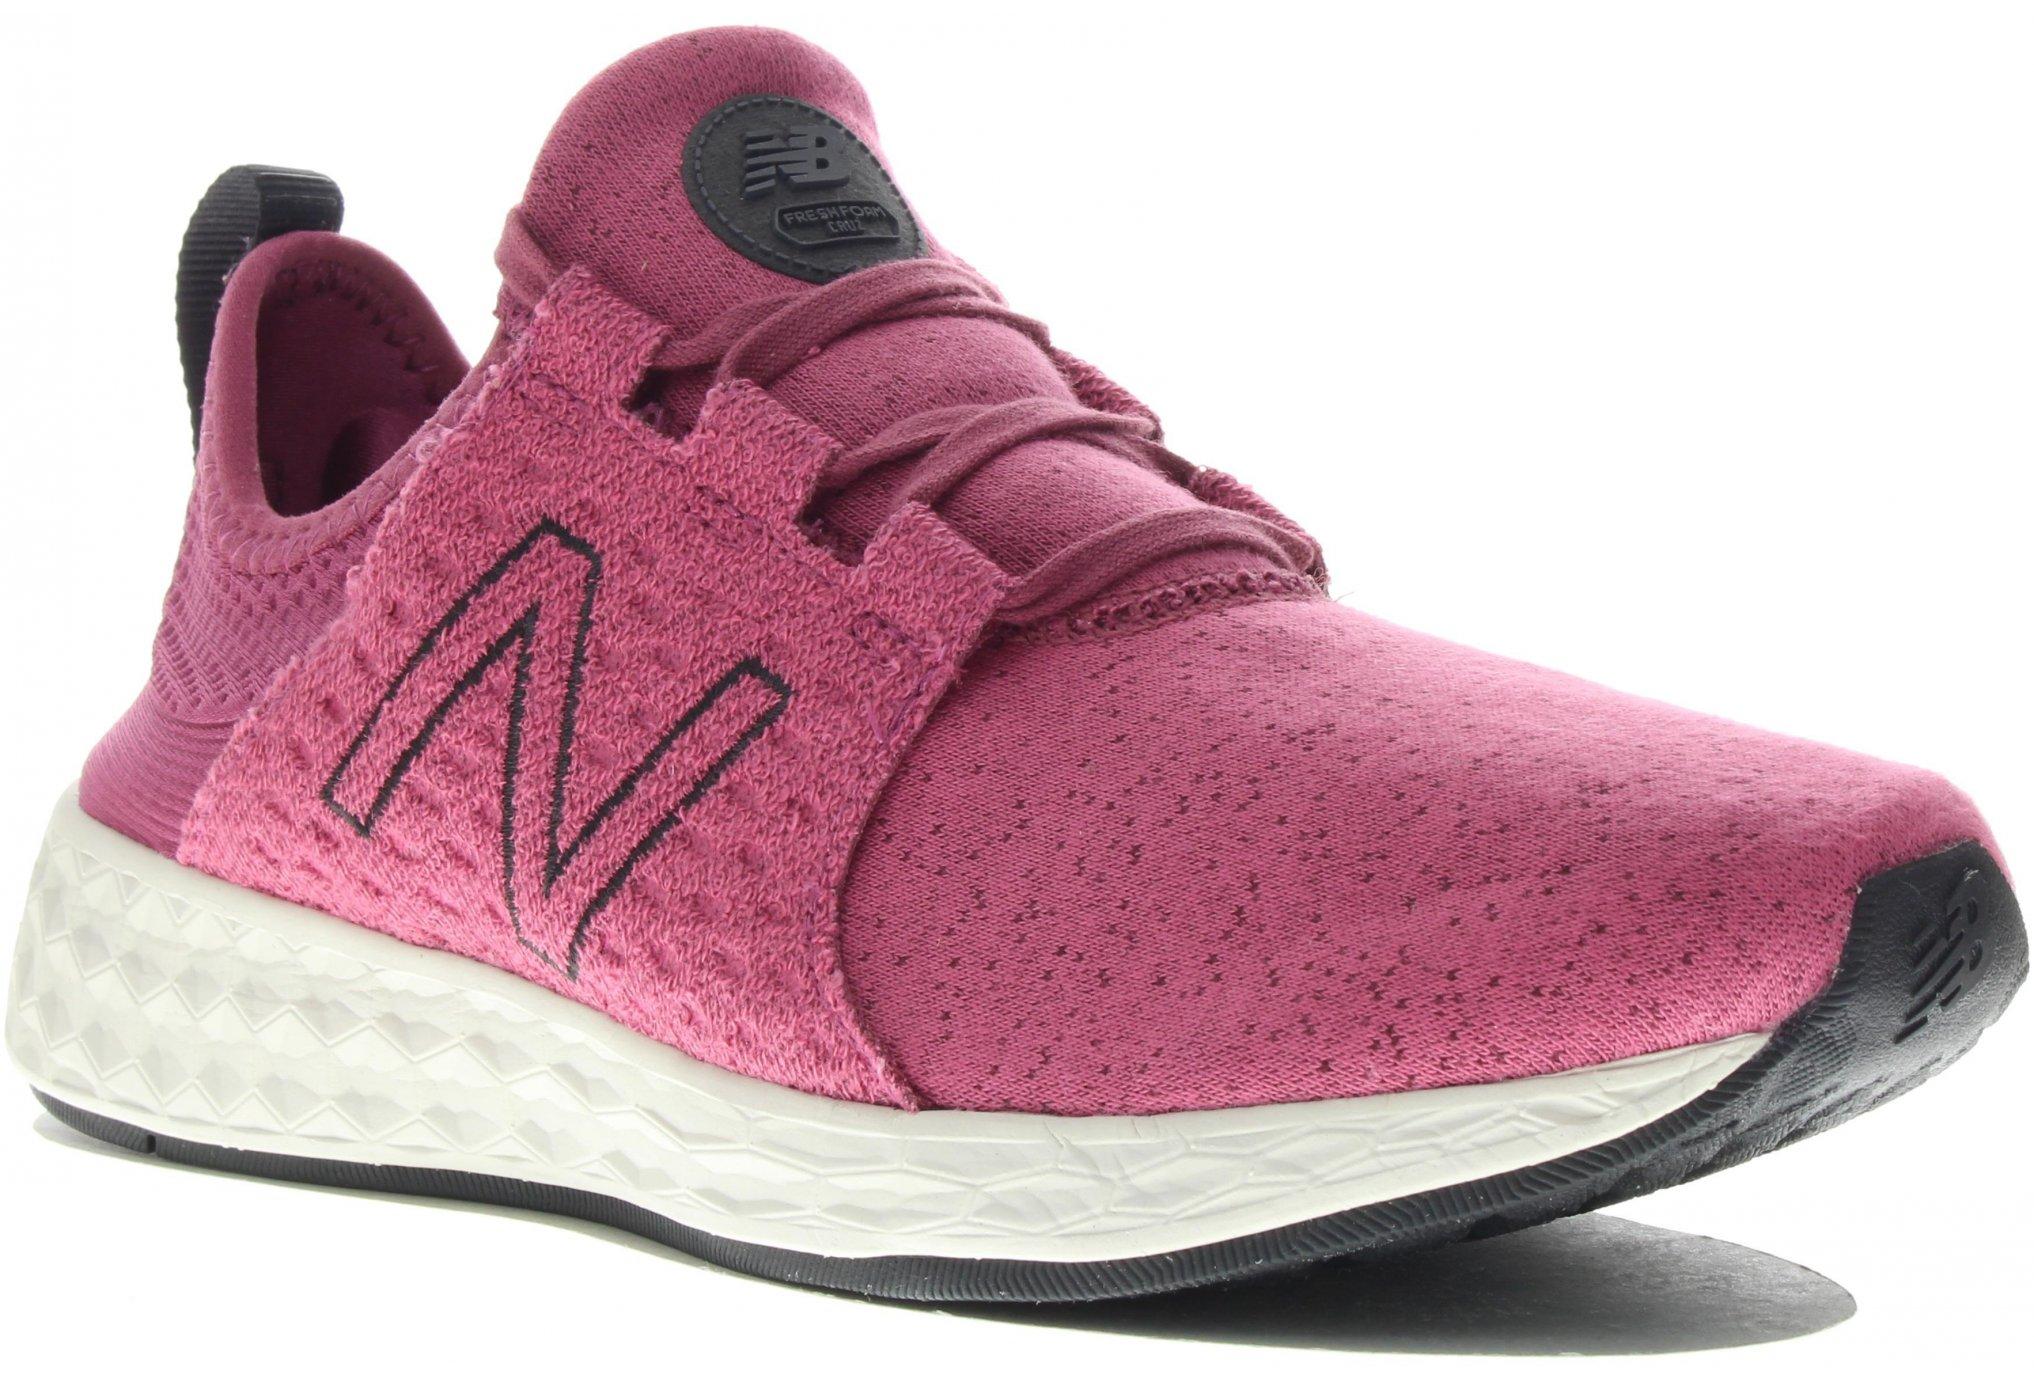 New Balance Fresh Foam Cruz Retro Hoodie W Diététique Chaussures femme